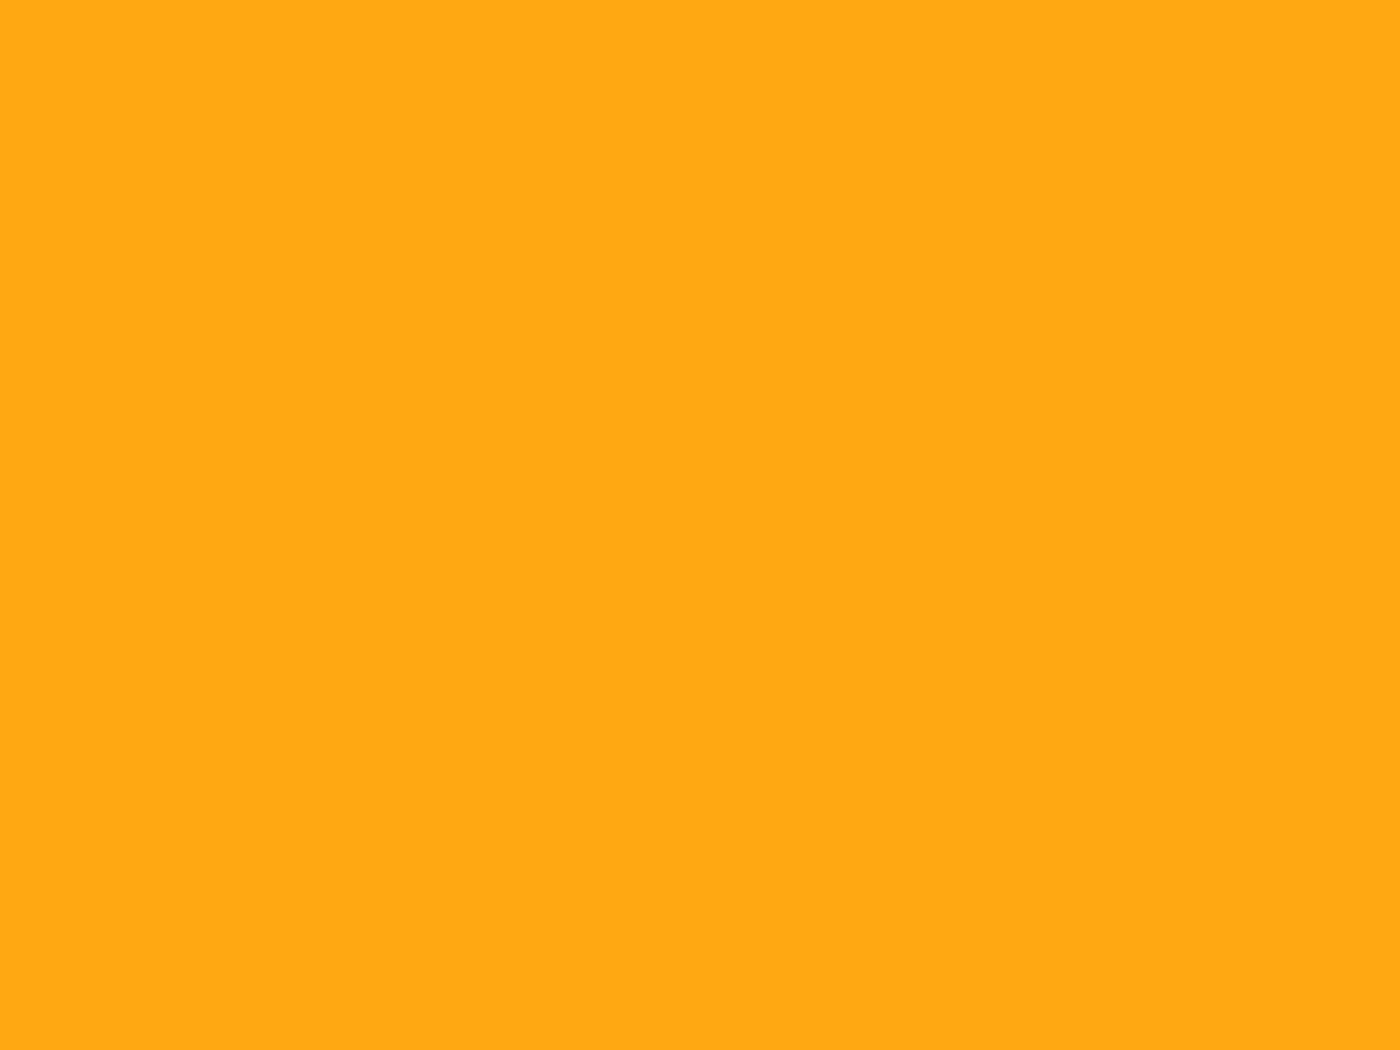 1400x1050 Dark Tangerine Solid Color Background